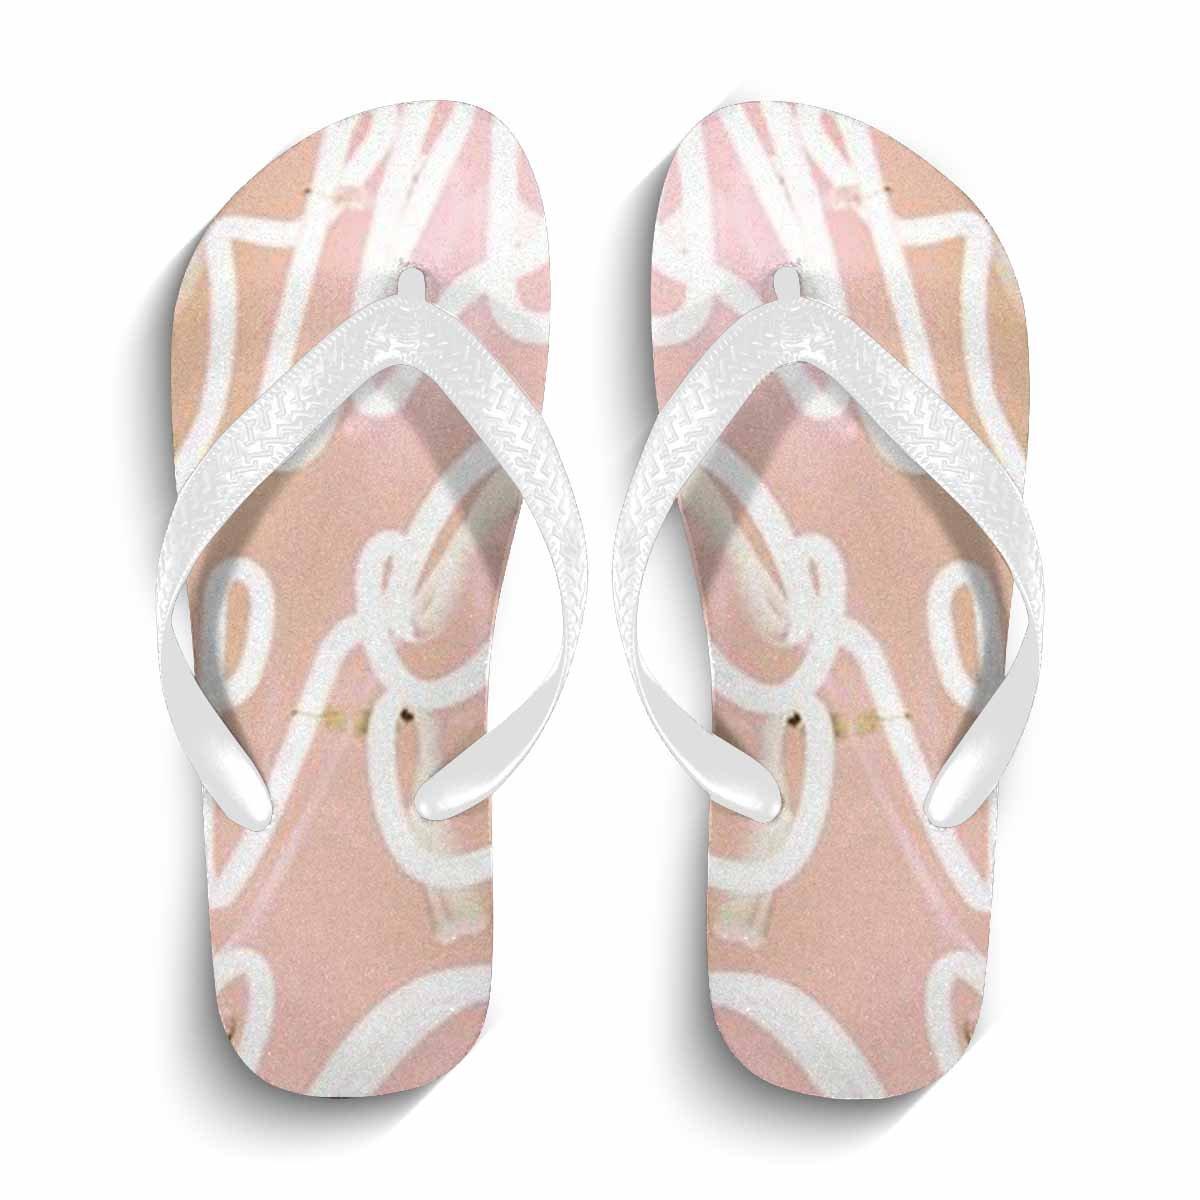 Eric Carl Flip Flops for Women,Stylish Beach Flip Flops Summer Flip Flop Sandals Slippers,Comfortable Beach Casual Shoes